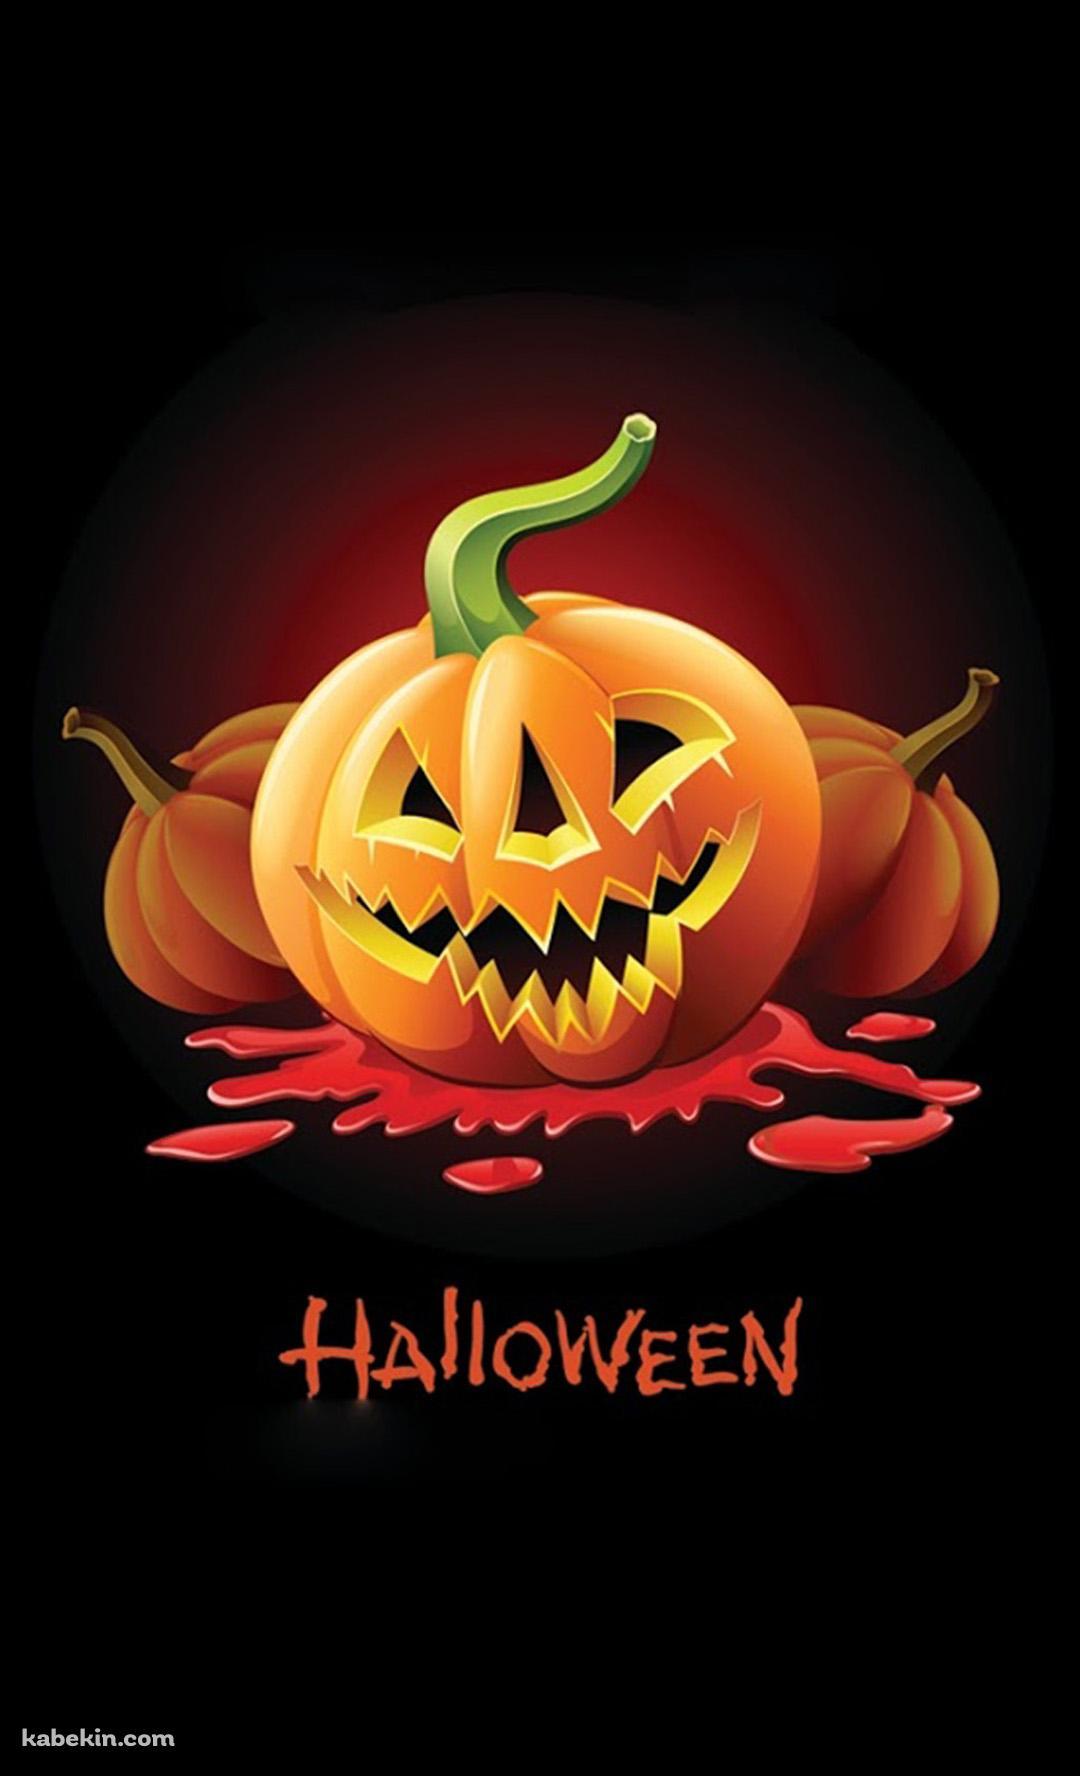 Halloweenのandroid壁紙 1080 X 1776 壁紙キングダム スマホ版